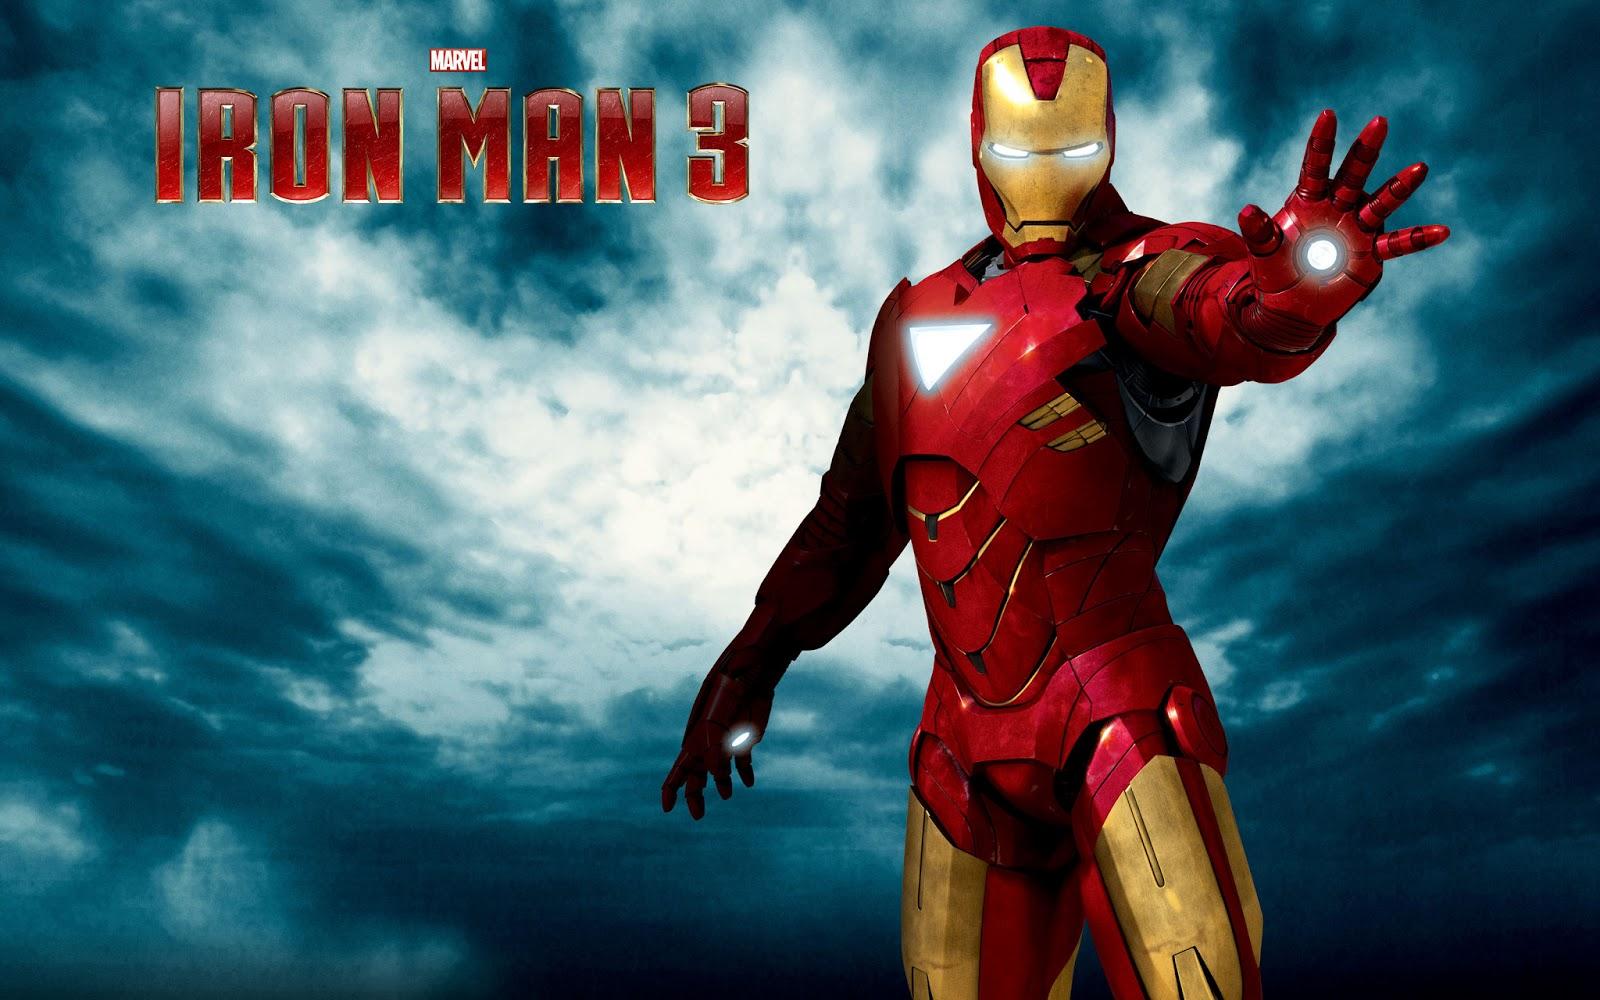 Iron Man Wallpapers: HD Wallpapers: Iron Man 3 Wallpapers